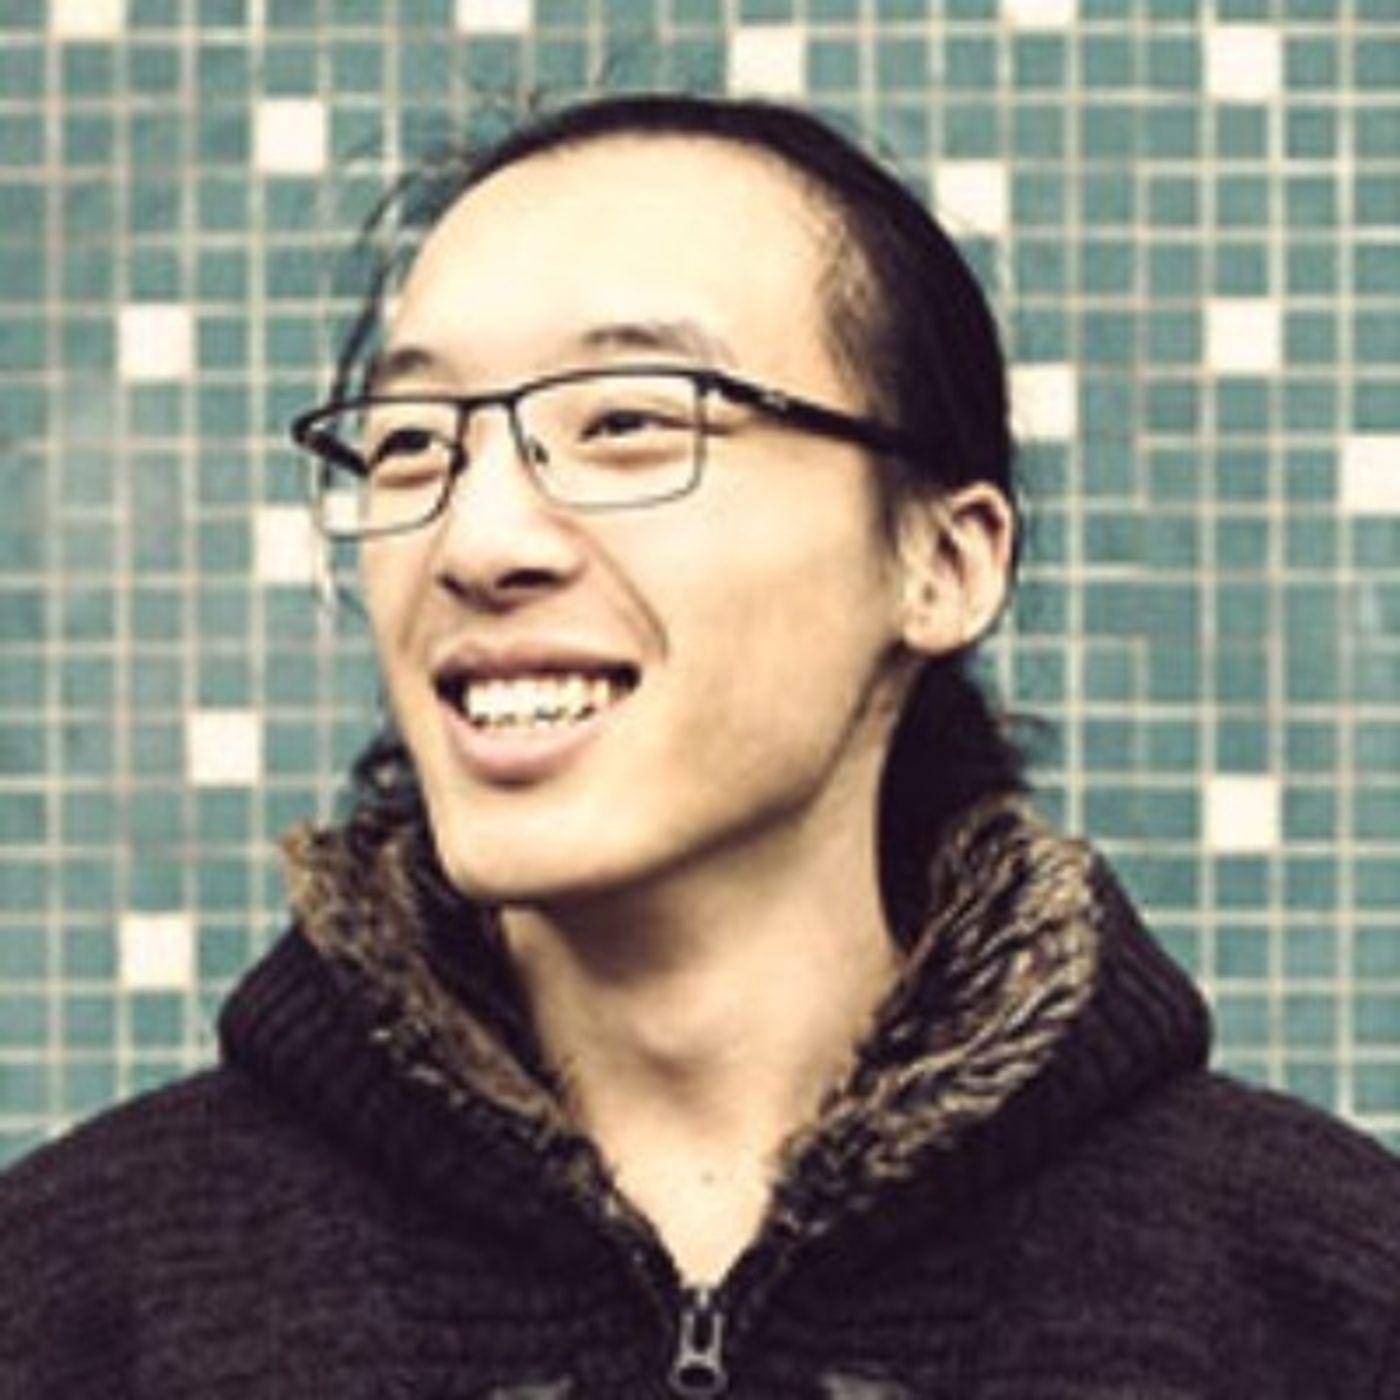 George Li is launching MiTEE Cube Satellites and making TikToks